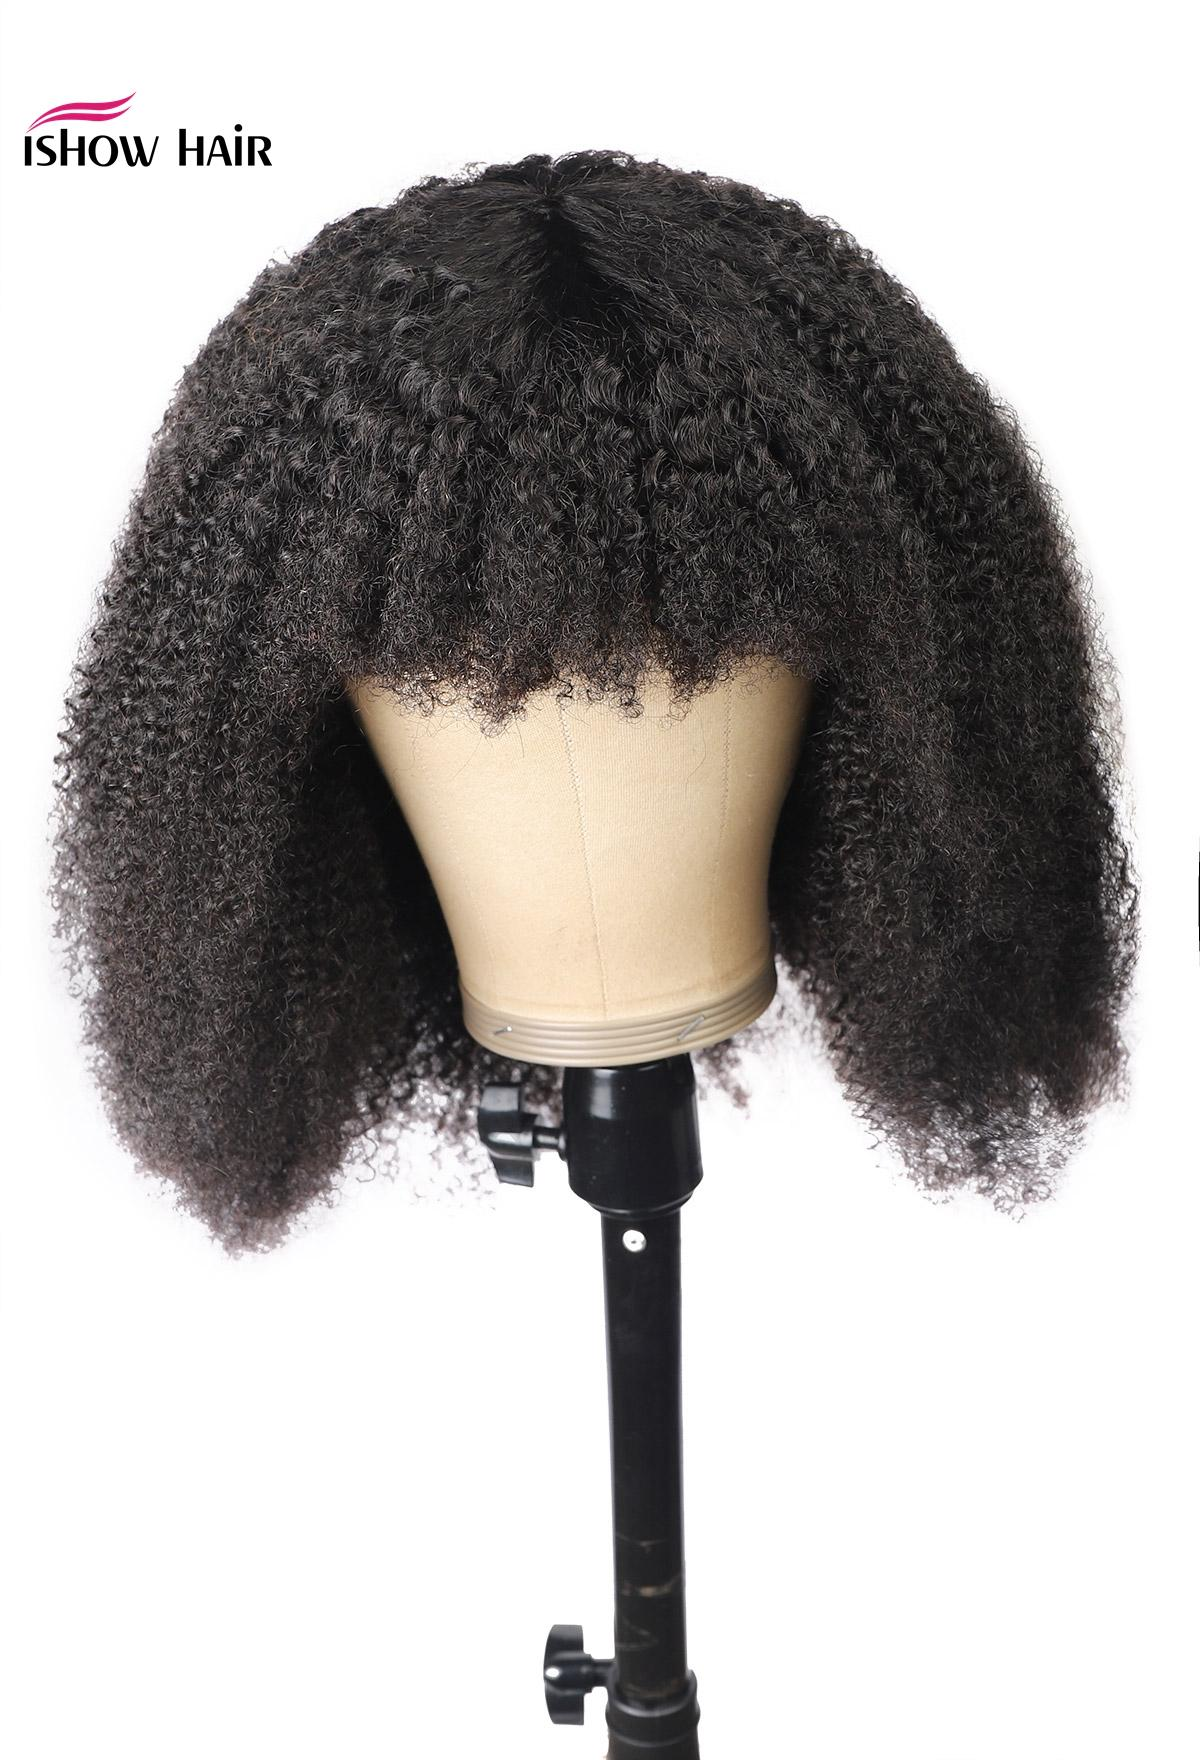 Ishow Afro verworren Curly Short Bob Perücken Gerade Menschenhaar-Perücken mit Bangs losen tiefen Körper peruanische Keine Spitze-Perücken indischen Haar Malaysian